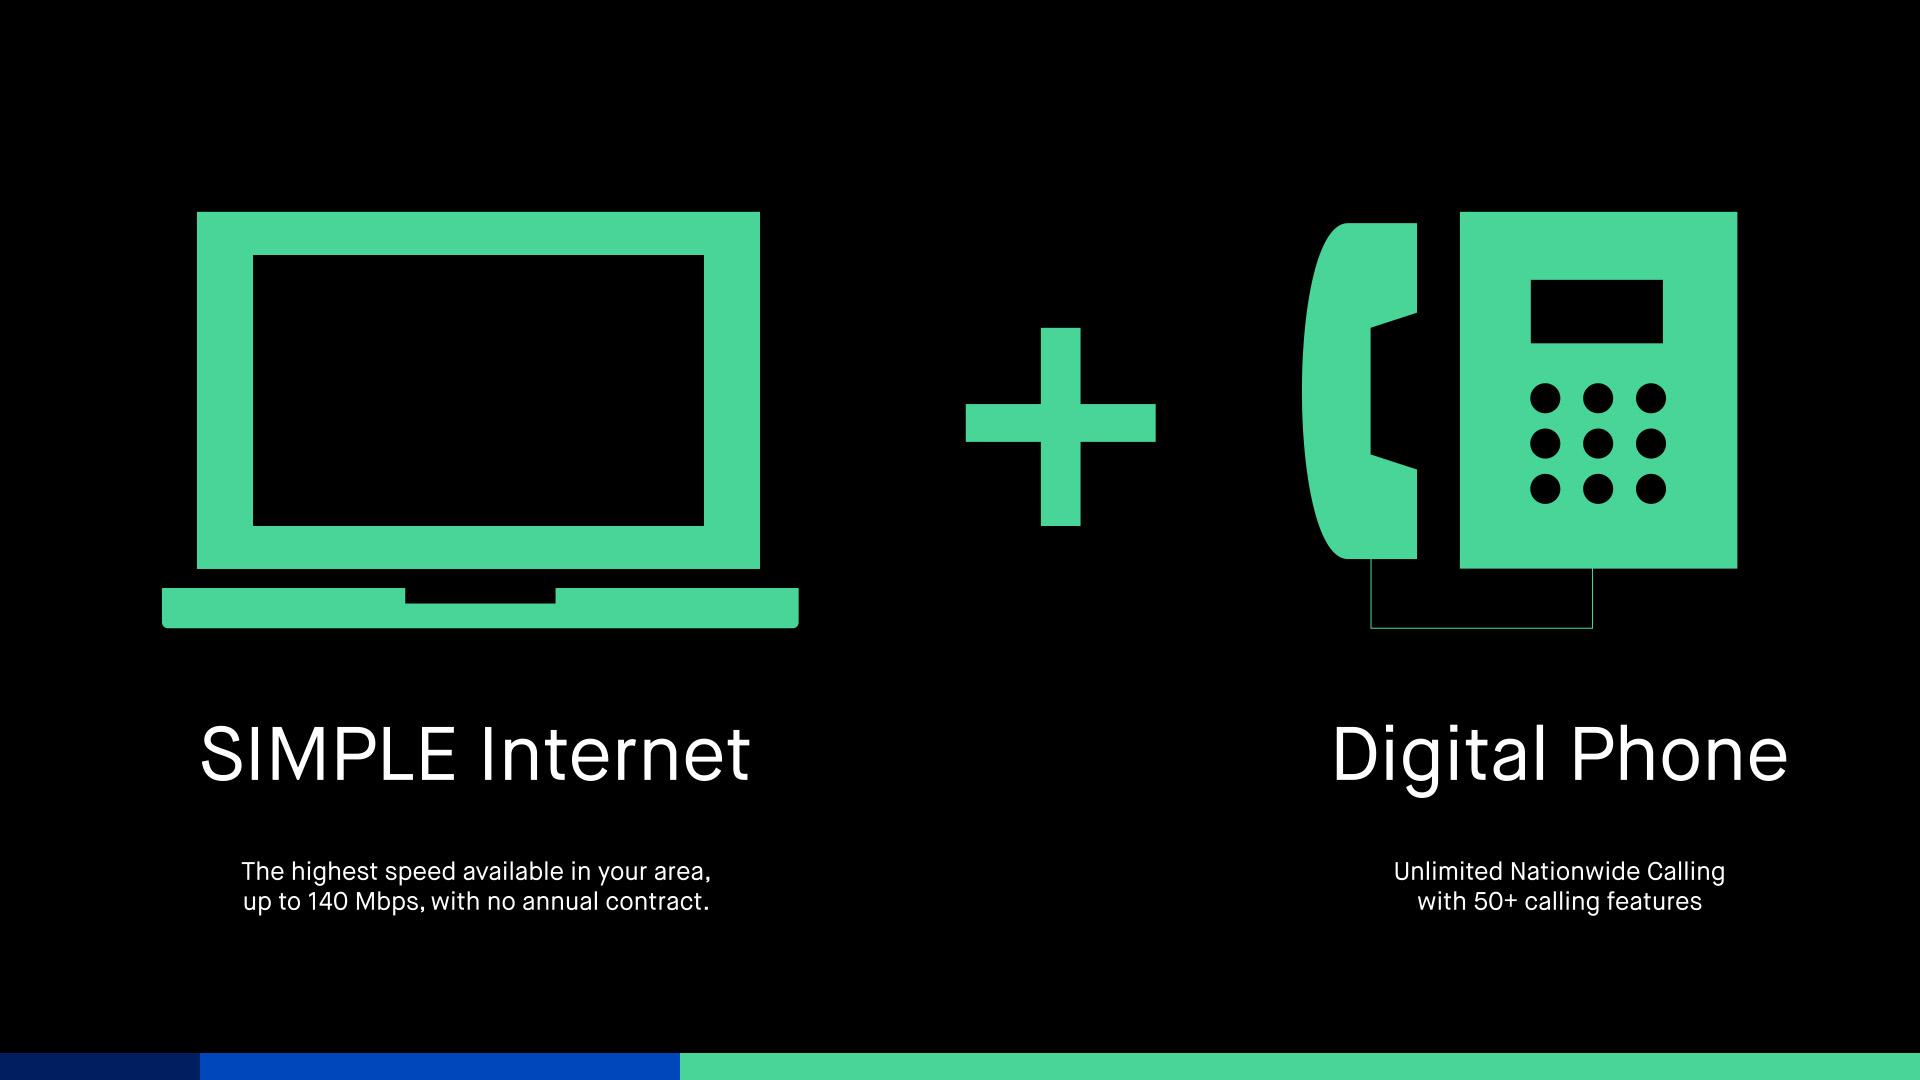 Bundled Internet + Digital Phone = SIMPLE